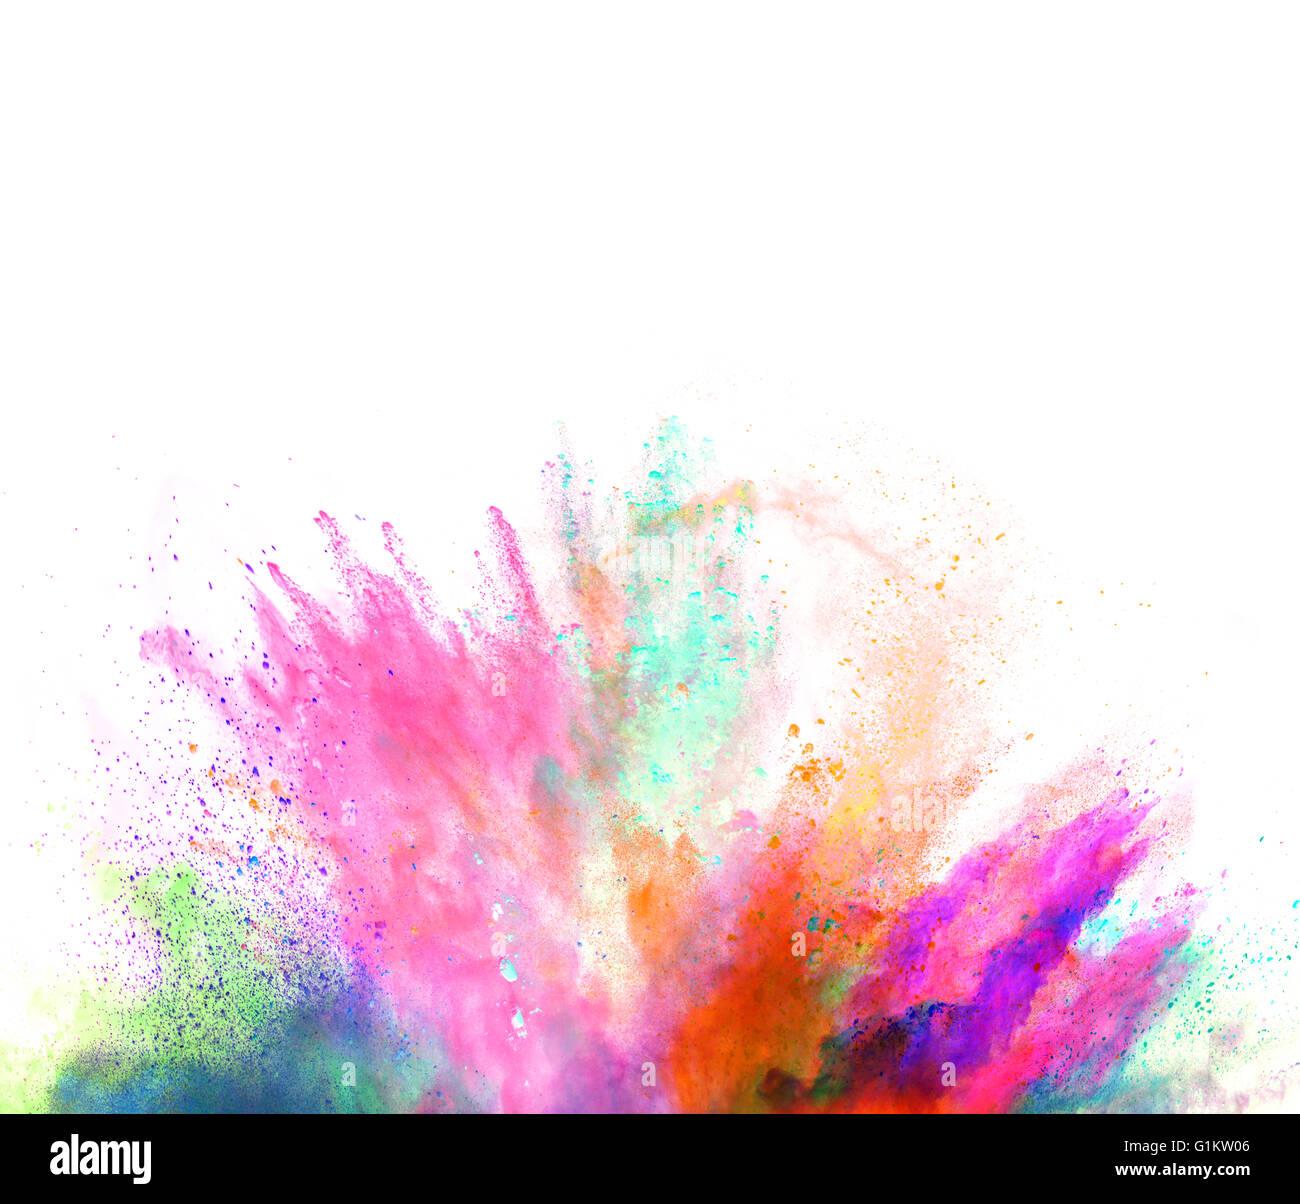 Explosión de polvo coloreado aislado sobre fondo blanco. Imagen De Stock